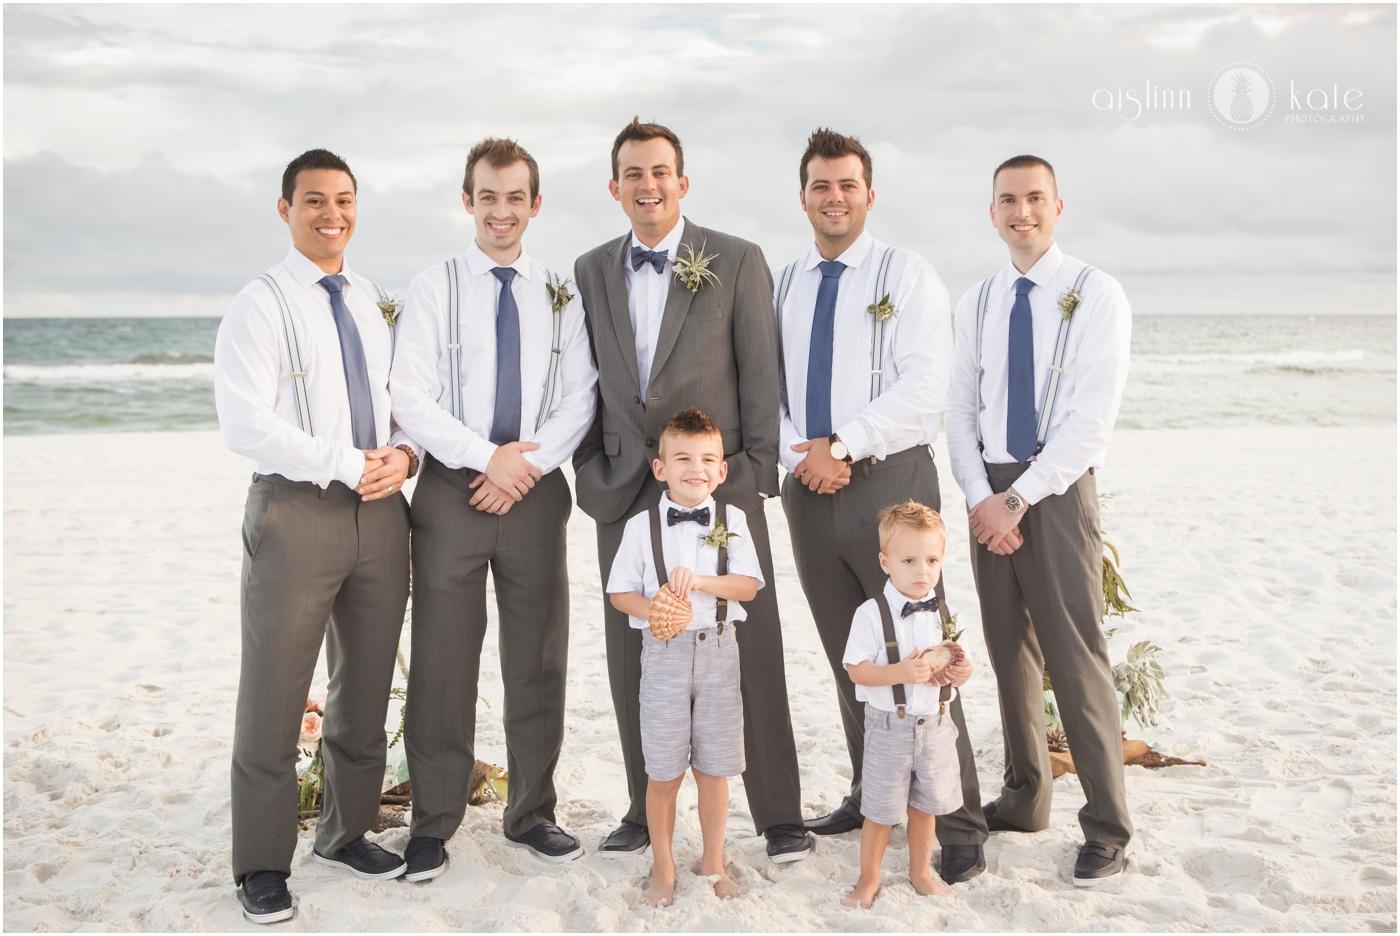 Pensacola-Destin-Wedding-Photographer_7883.jpg